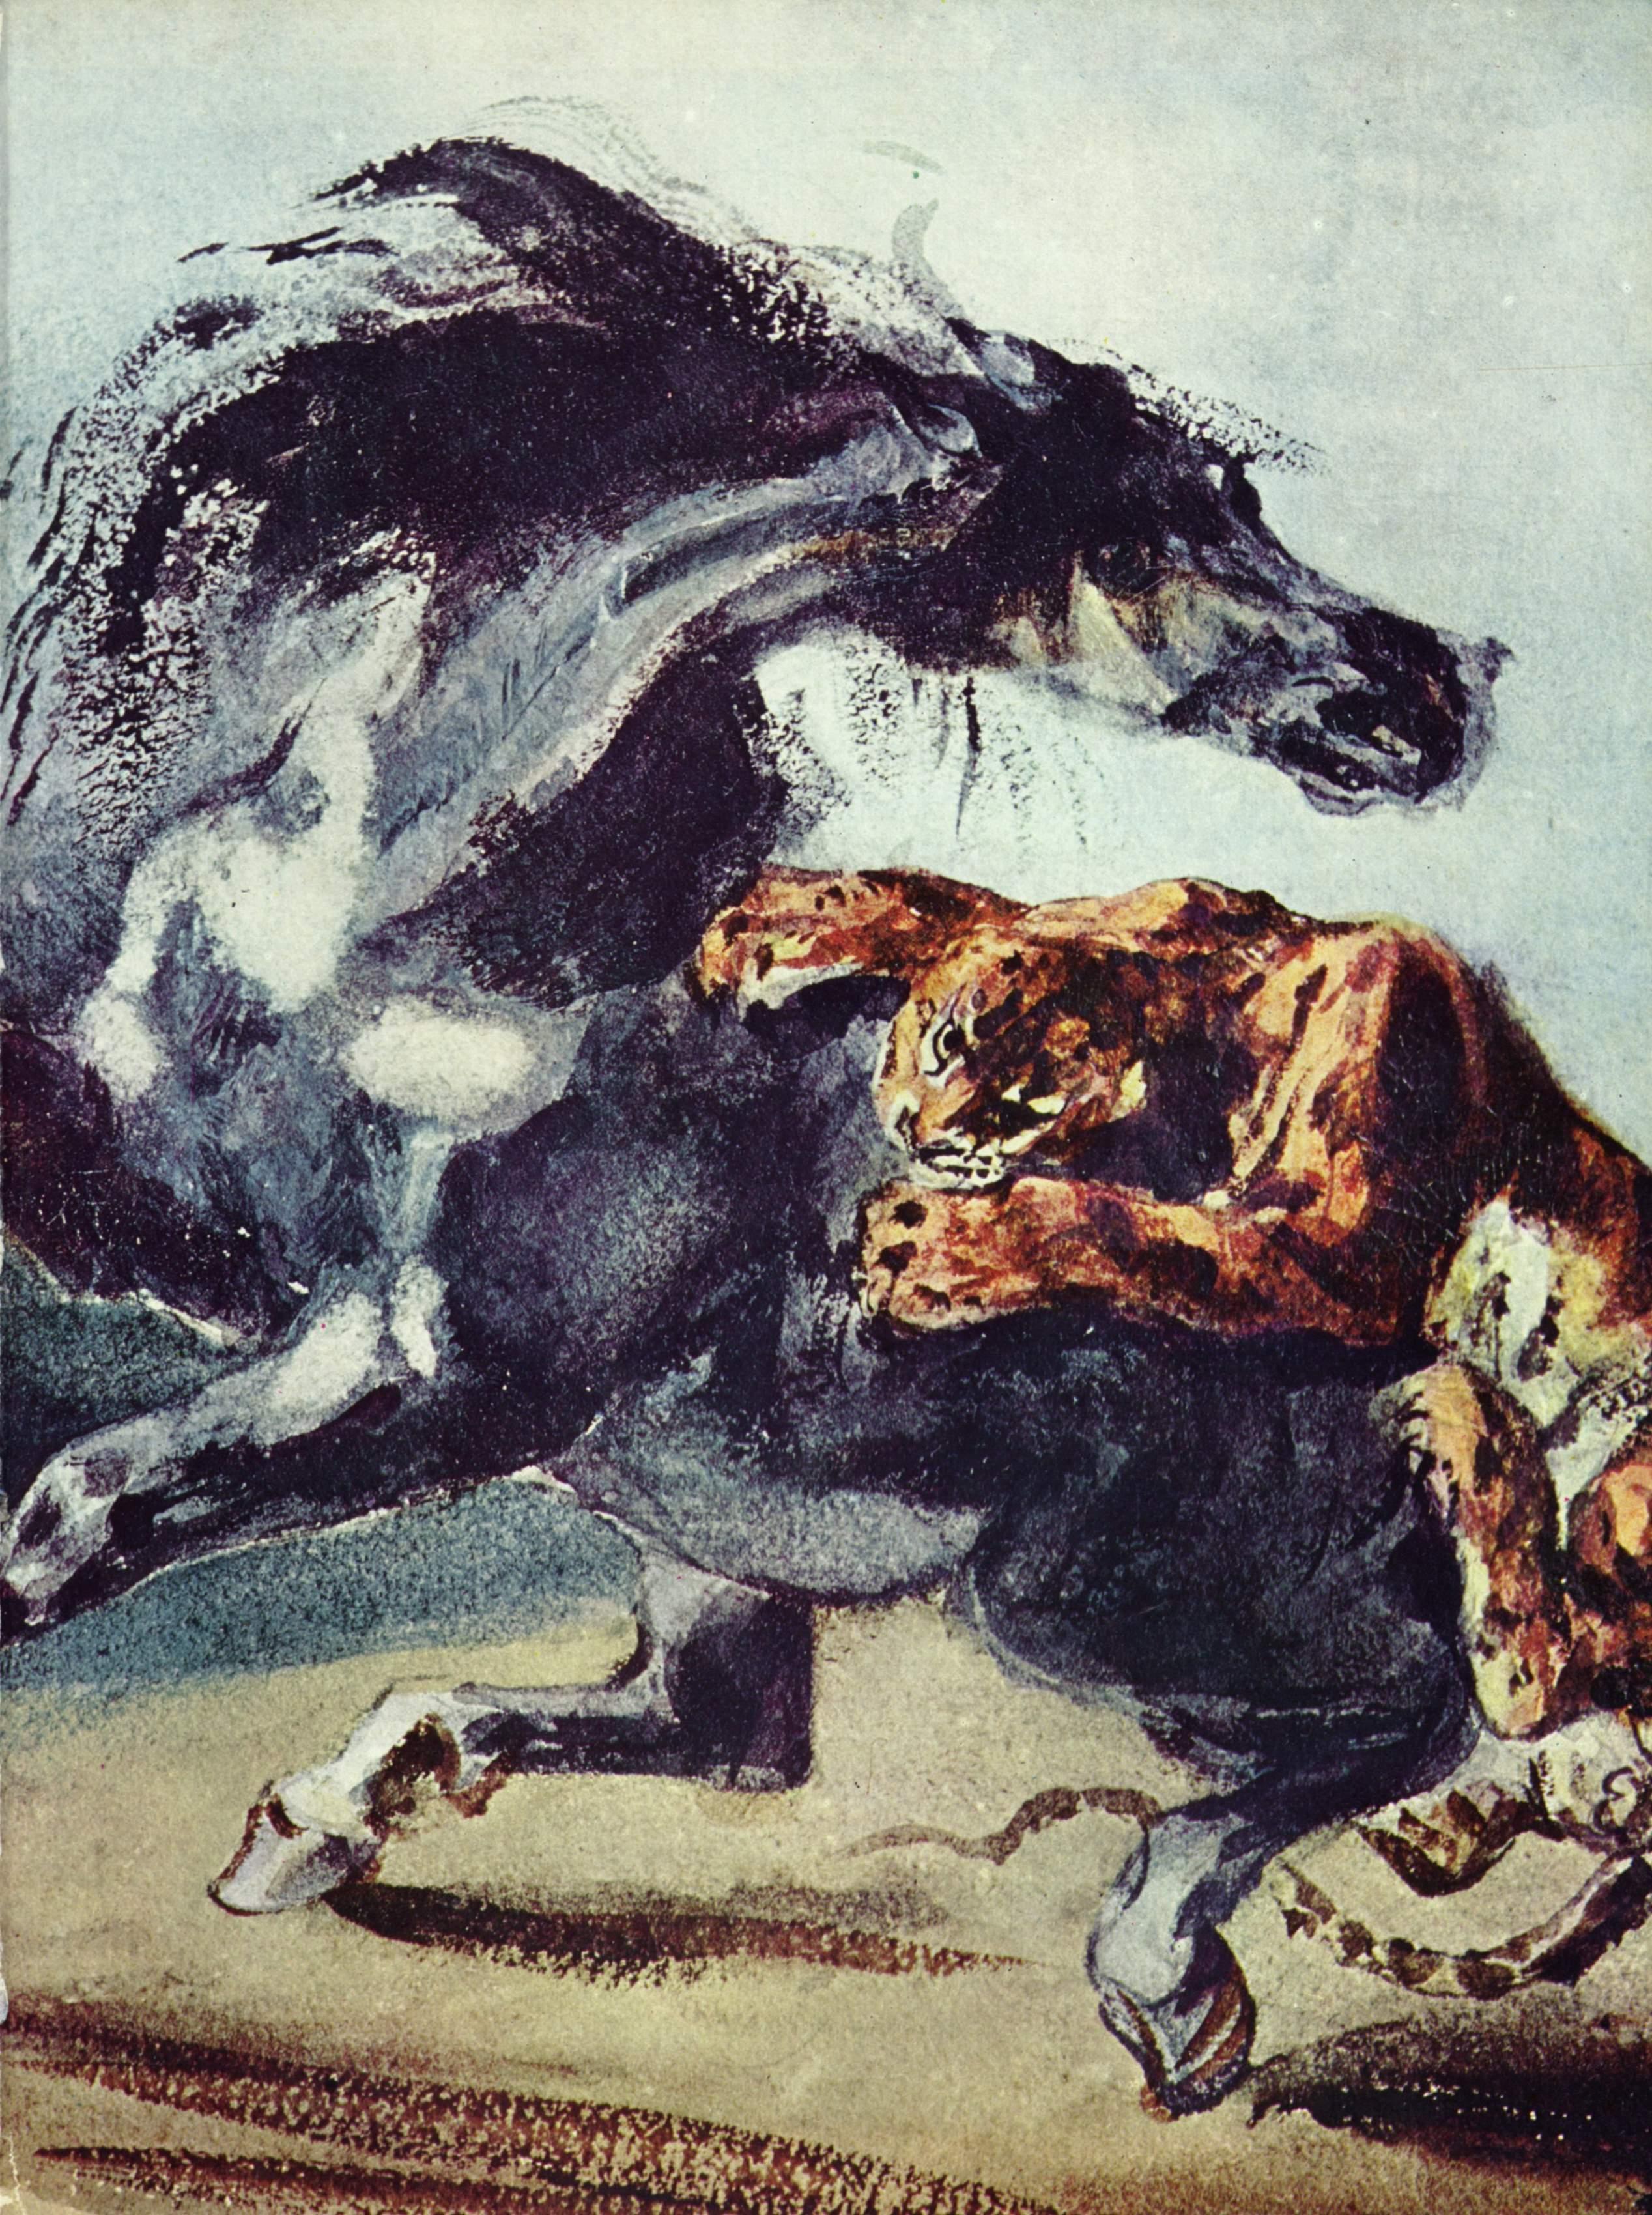 Тигр, напавший на лошадь, Делакруа Эжен Фердинанд Виктор